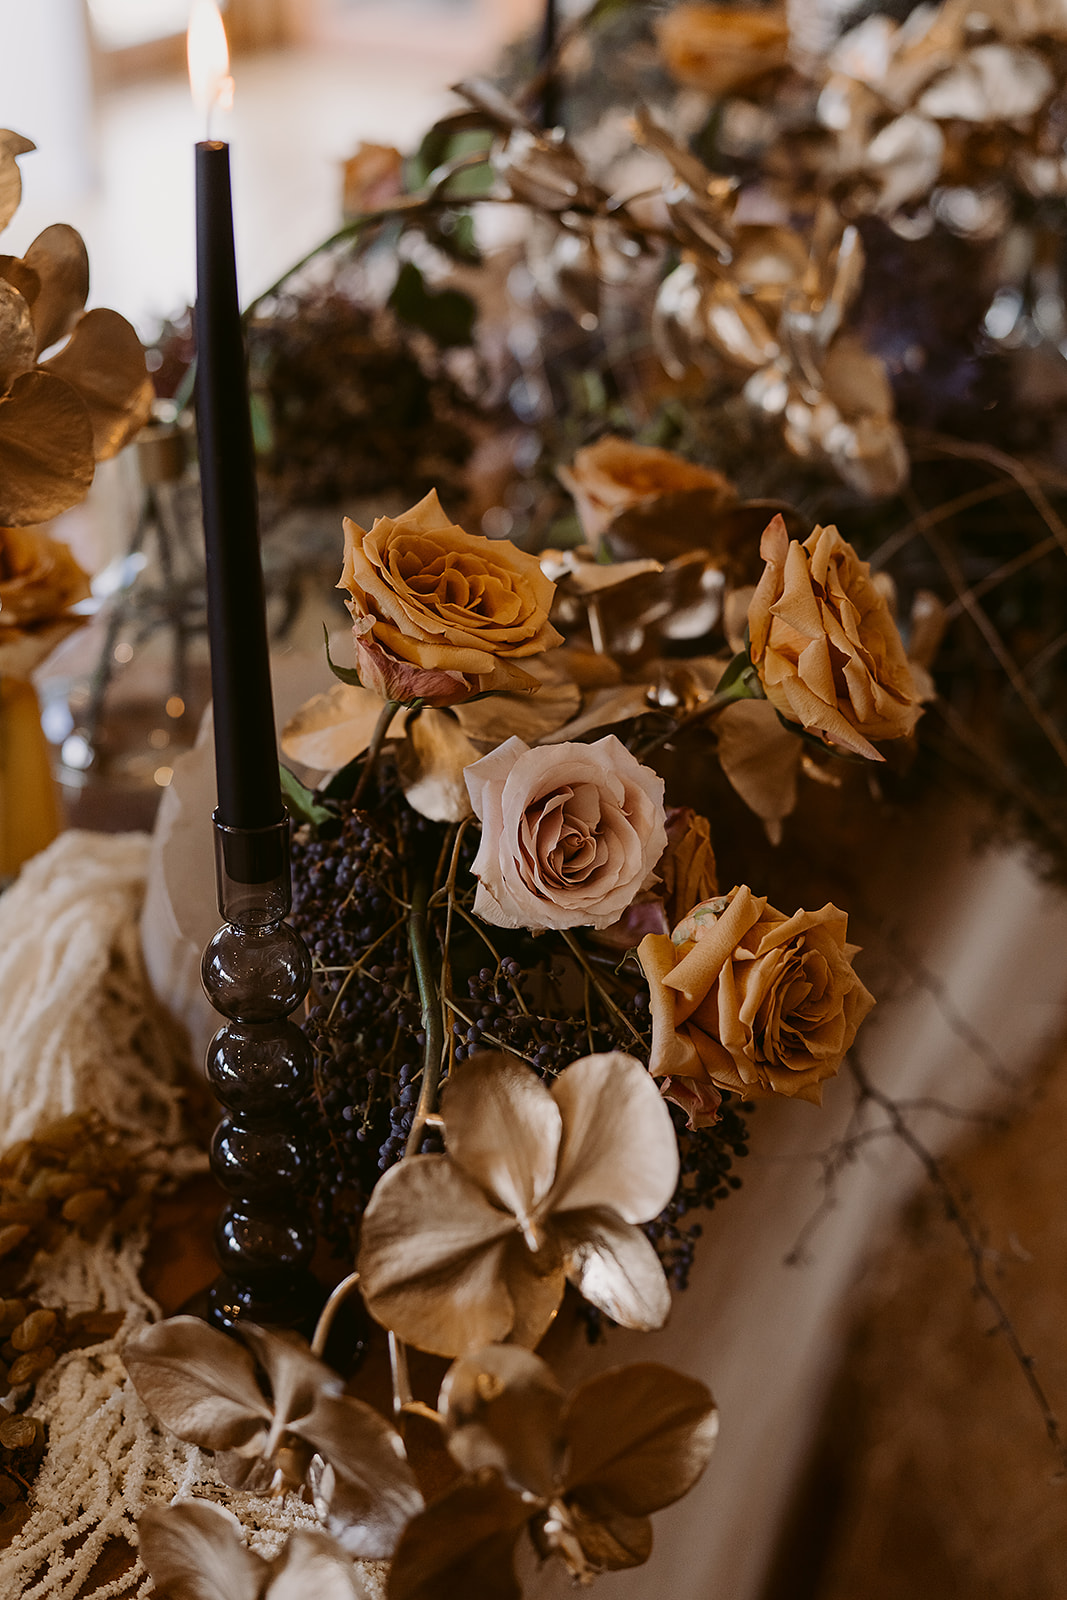 Immerse_Yarra_Valley_Same_Sex_Wedding_-_Ashleigh_Haase_Photography-732.jpg